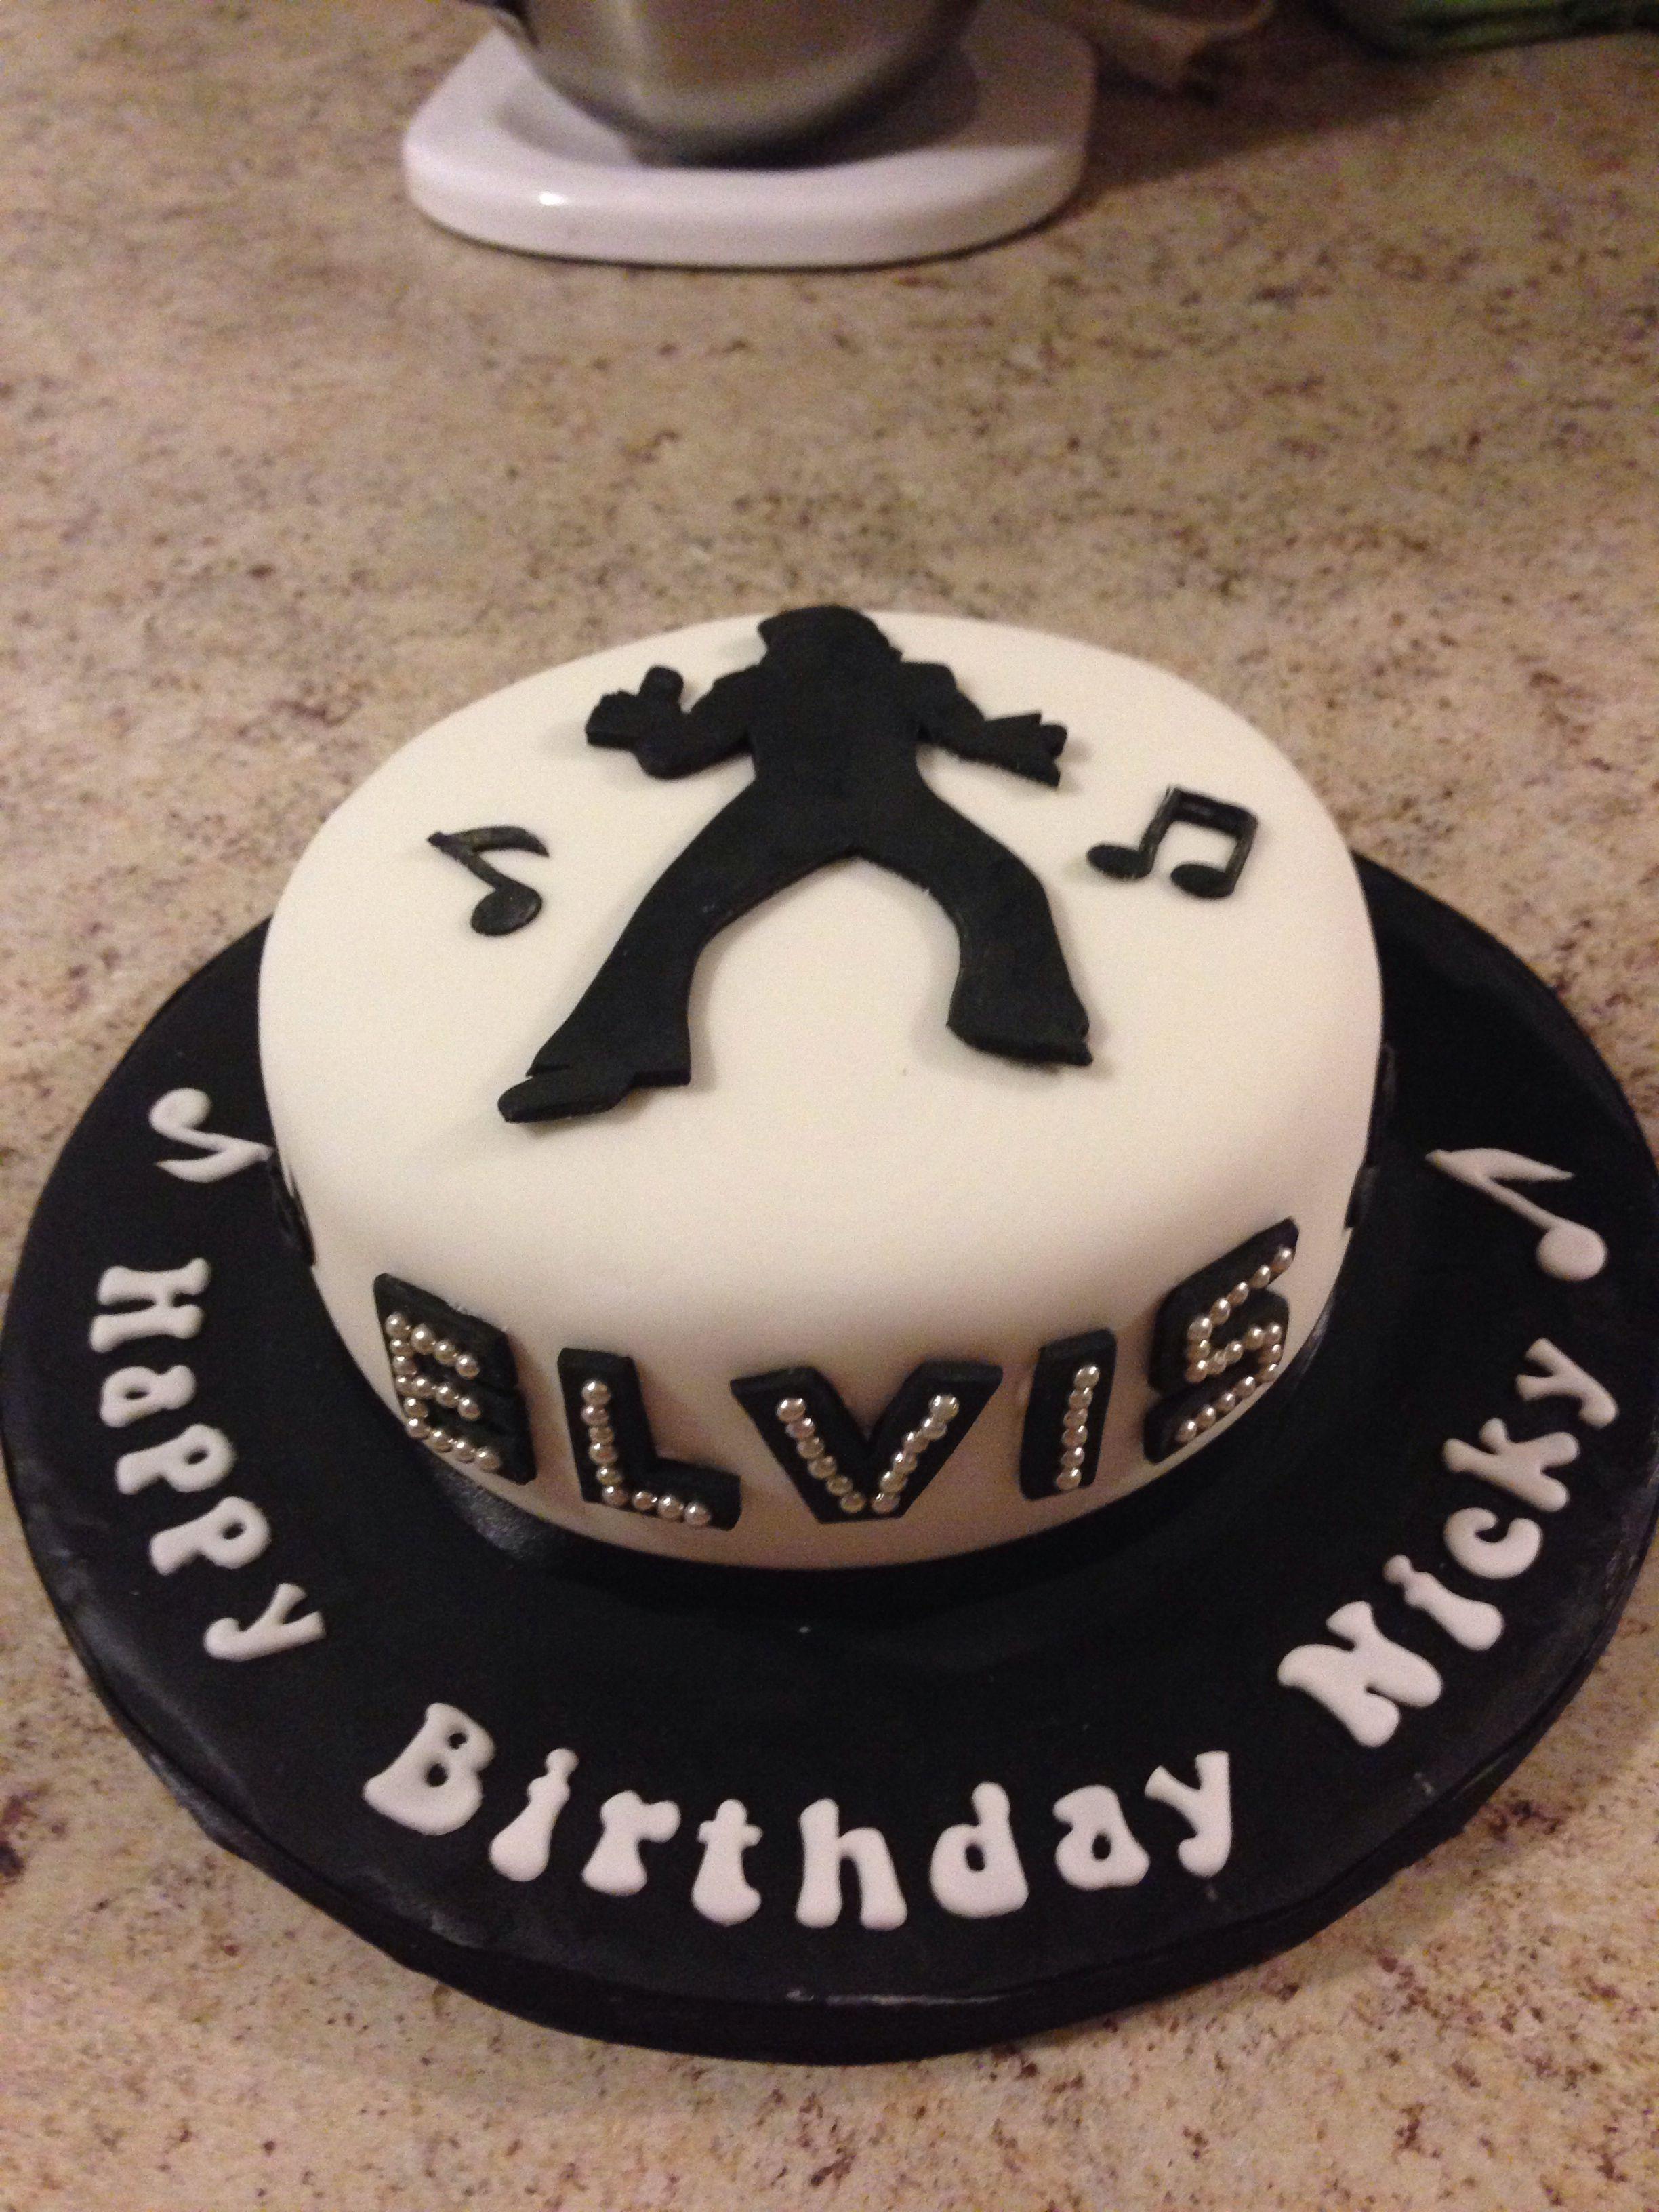 Elvis Cake All My Cakes Pinterest Elvis Cakes Cake And Elvis